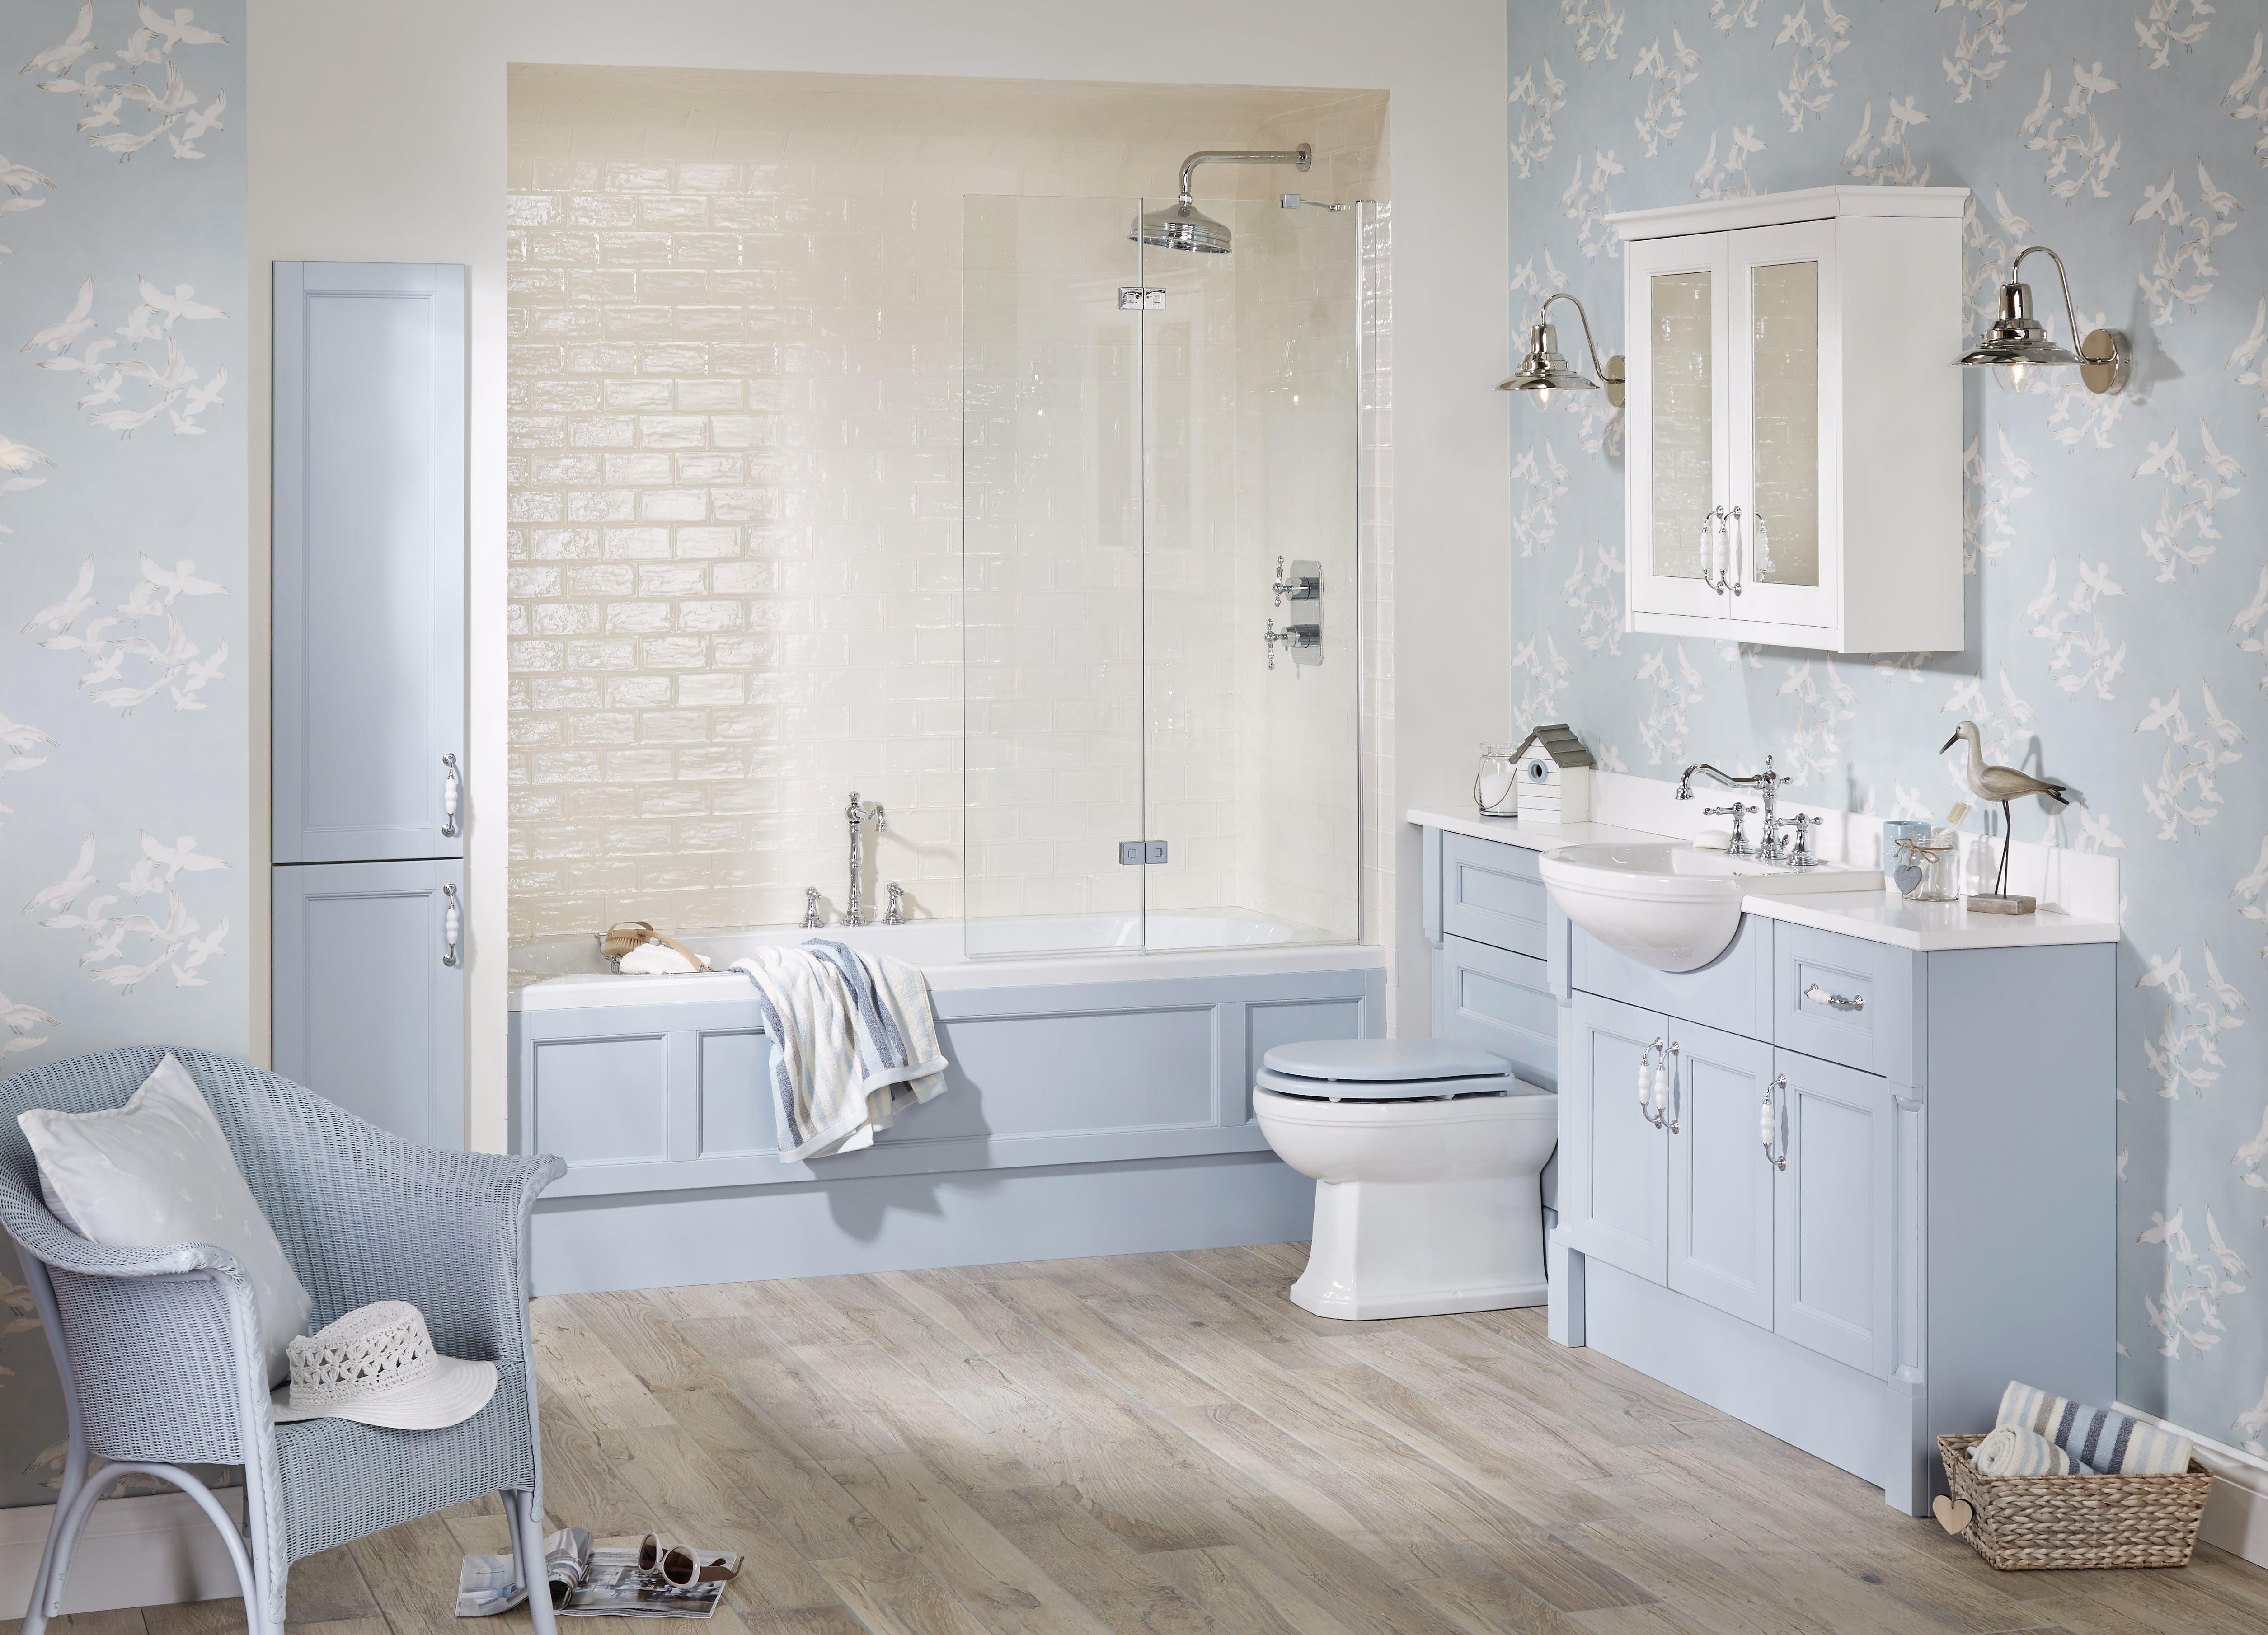 Pastel blue bathroom furniture from Utopia Bathrooms. | Pastels in ...